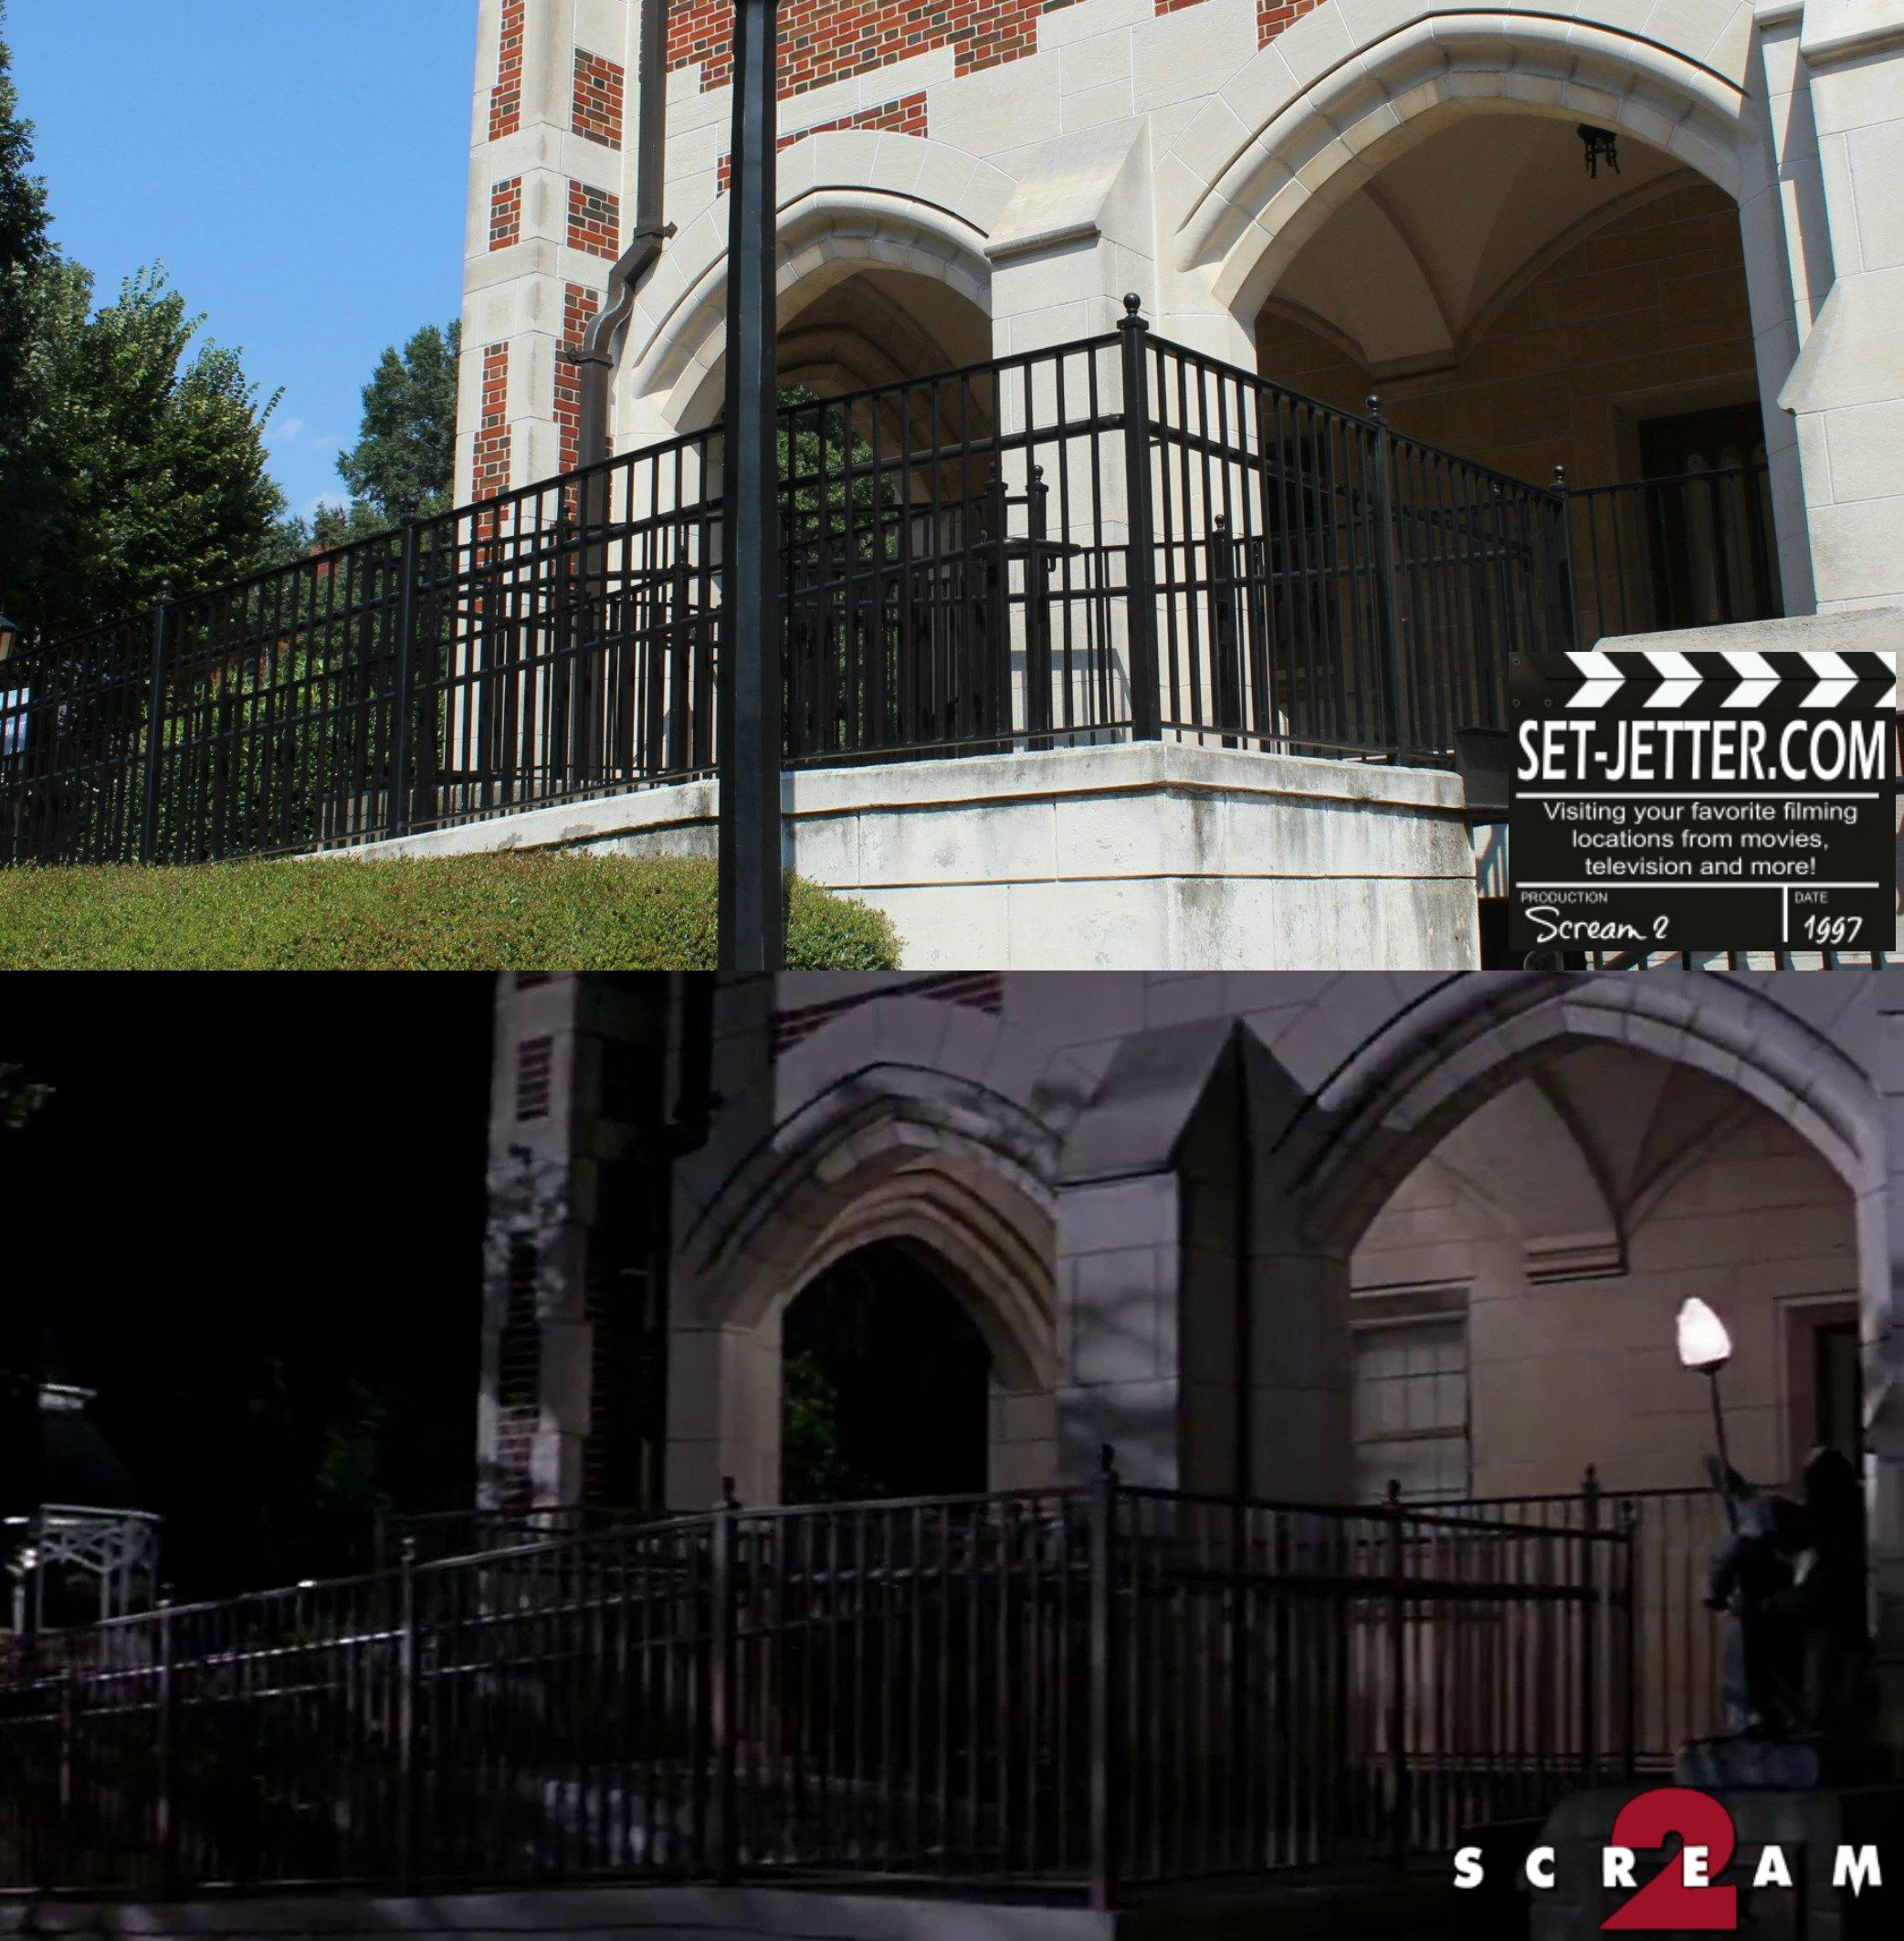 Scream 2 comparison 217.jpg